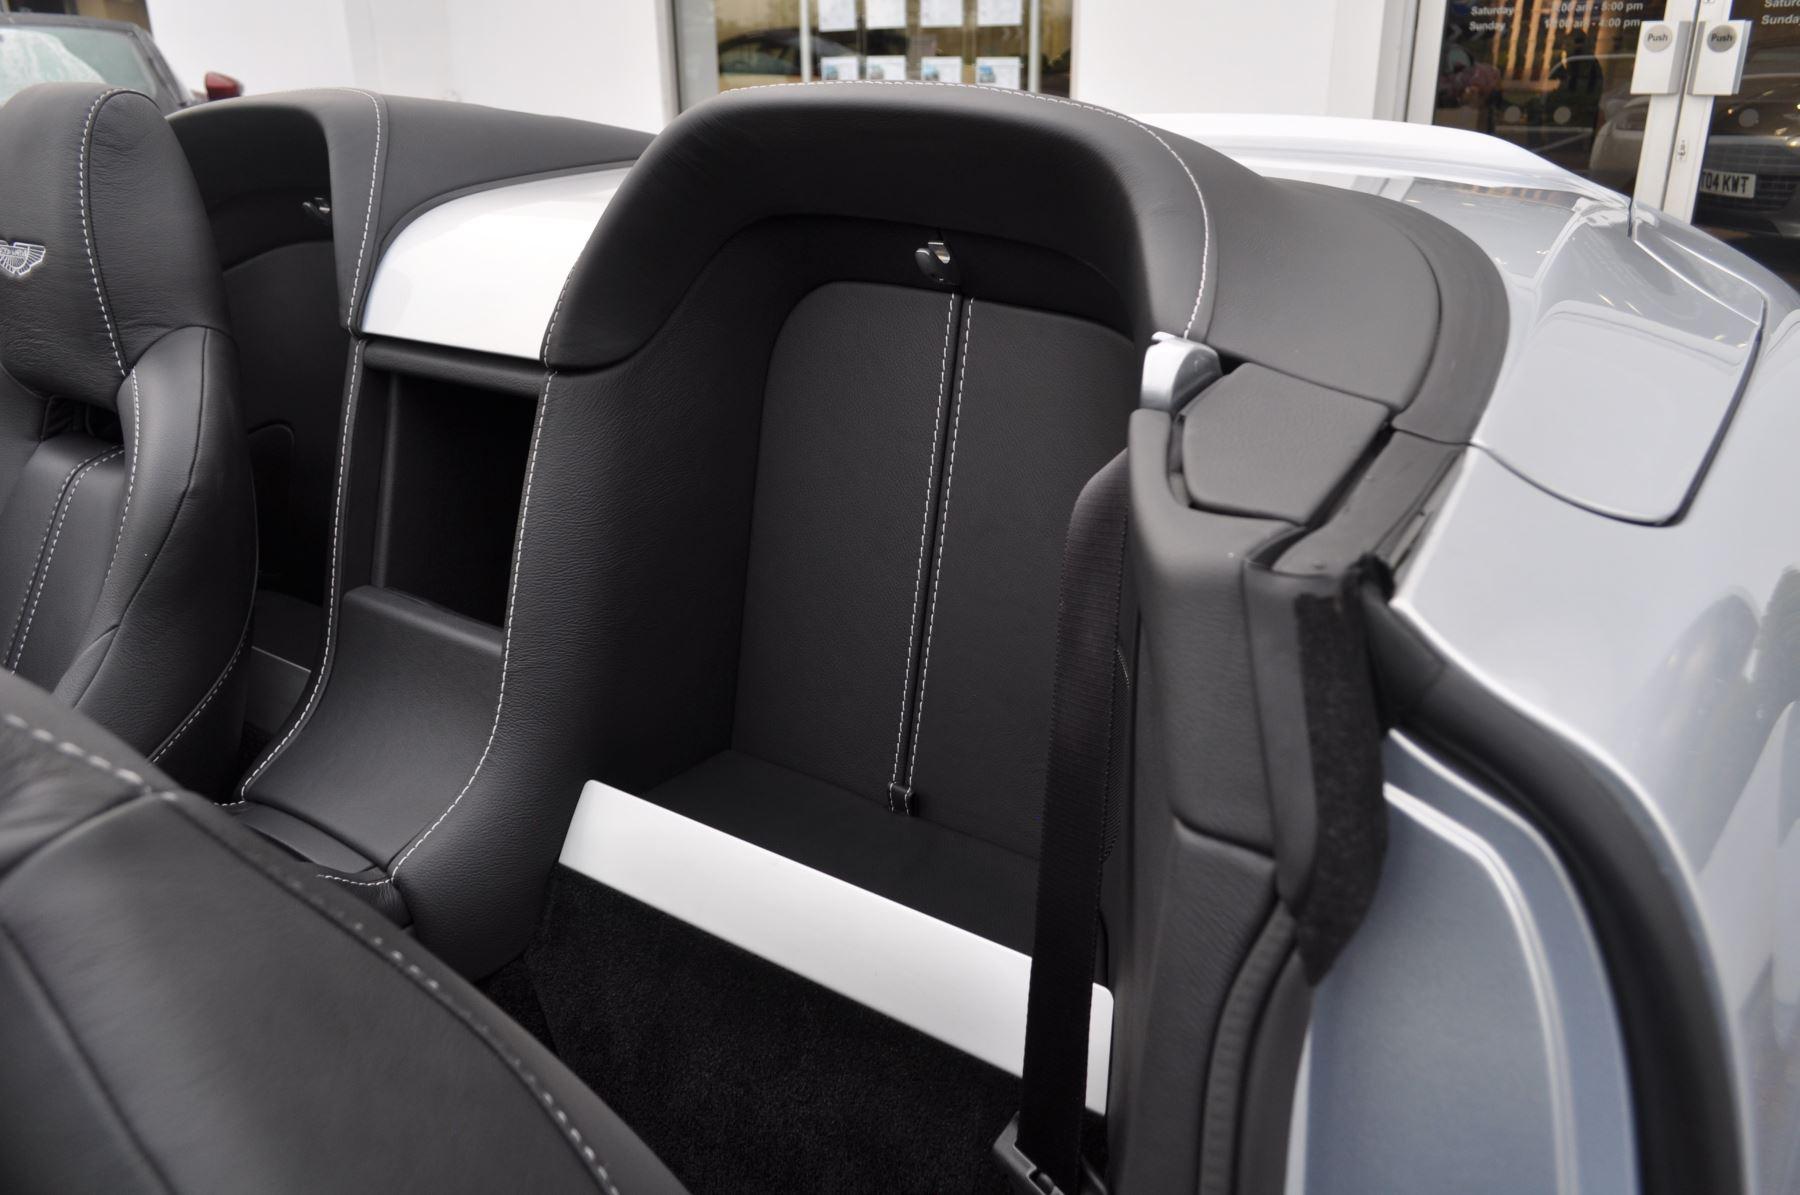 Aston Martin V12 Vantage S S 2dr Sportshift III image 25